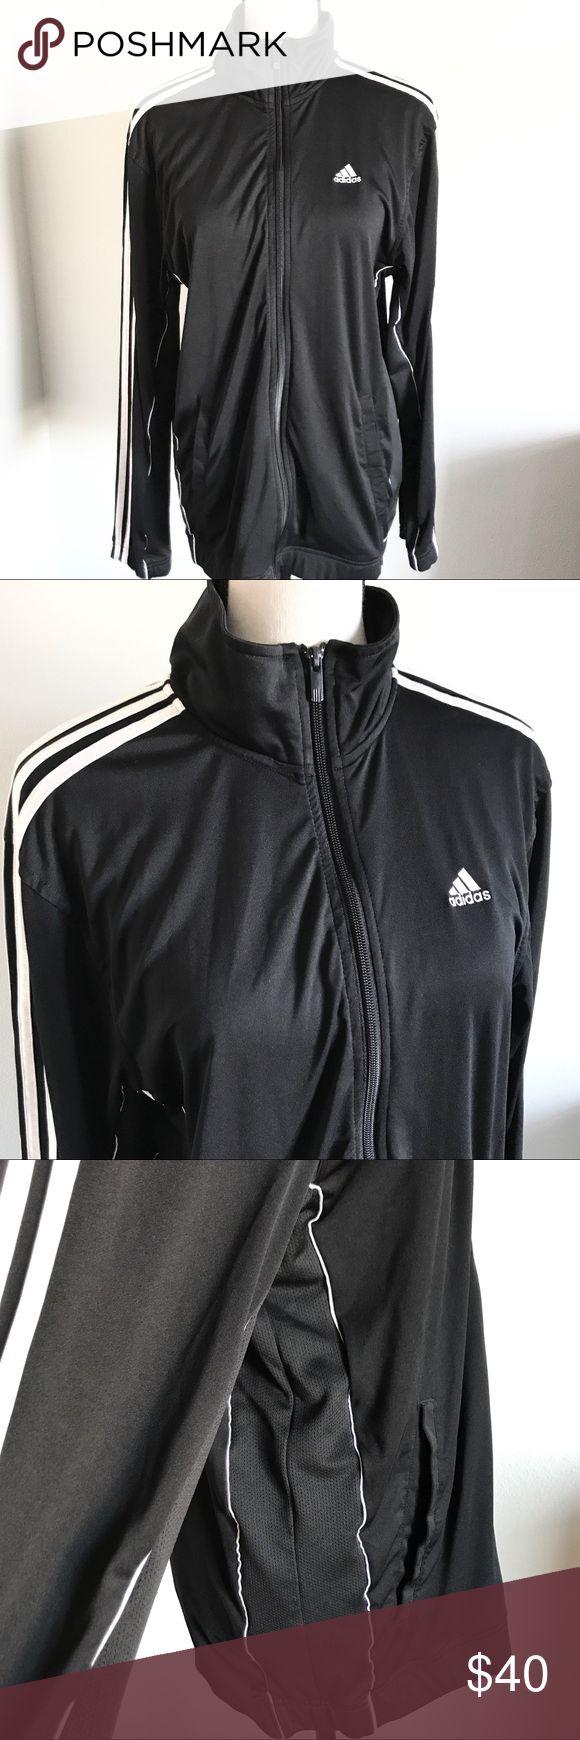 Adidas jacket Clima365 classic adidas jacket ~ men's small fits like a women large ~ EUC ~ no snags adidas Jackets & Coats